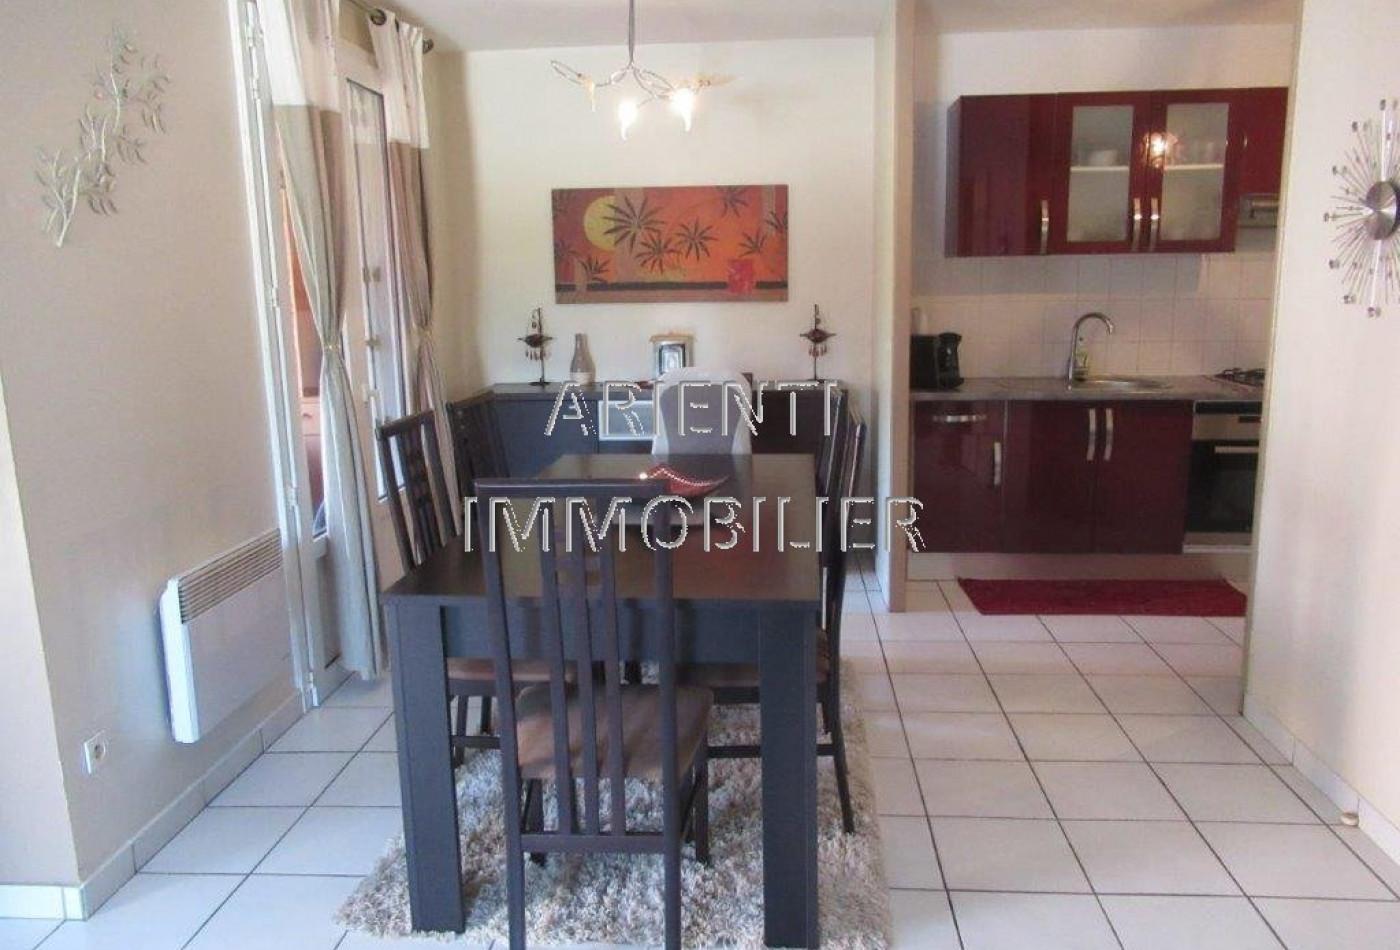 A vendre Dieulefit 260013121 Office immobilier arienti